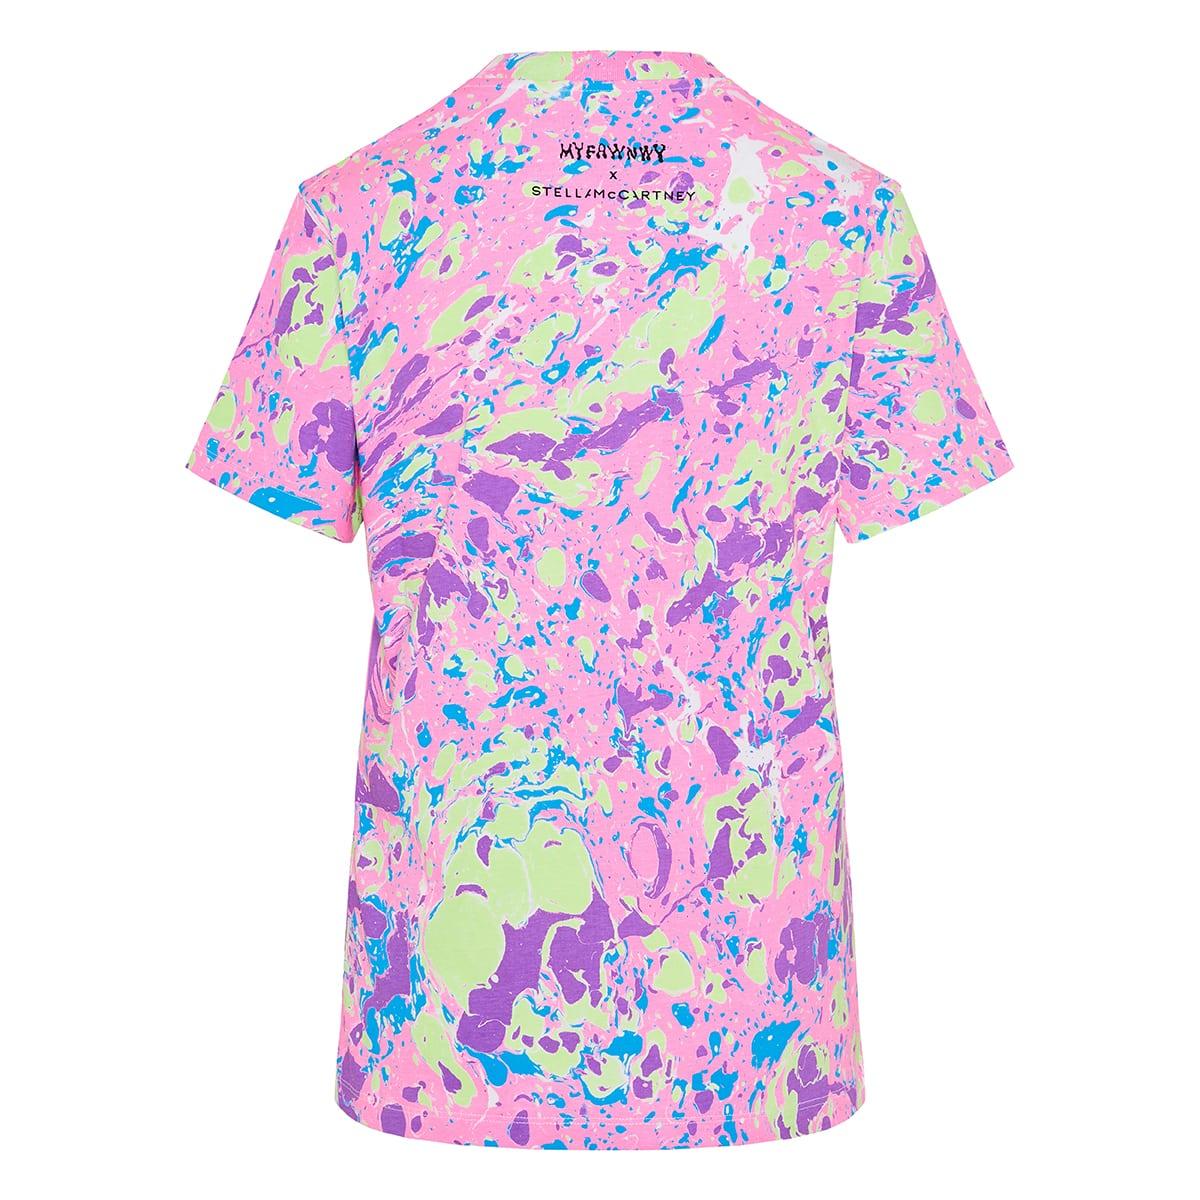 x MYFAWNWY printed cotton t-shirt